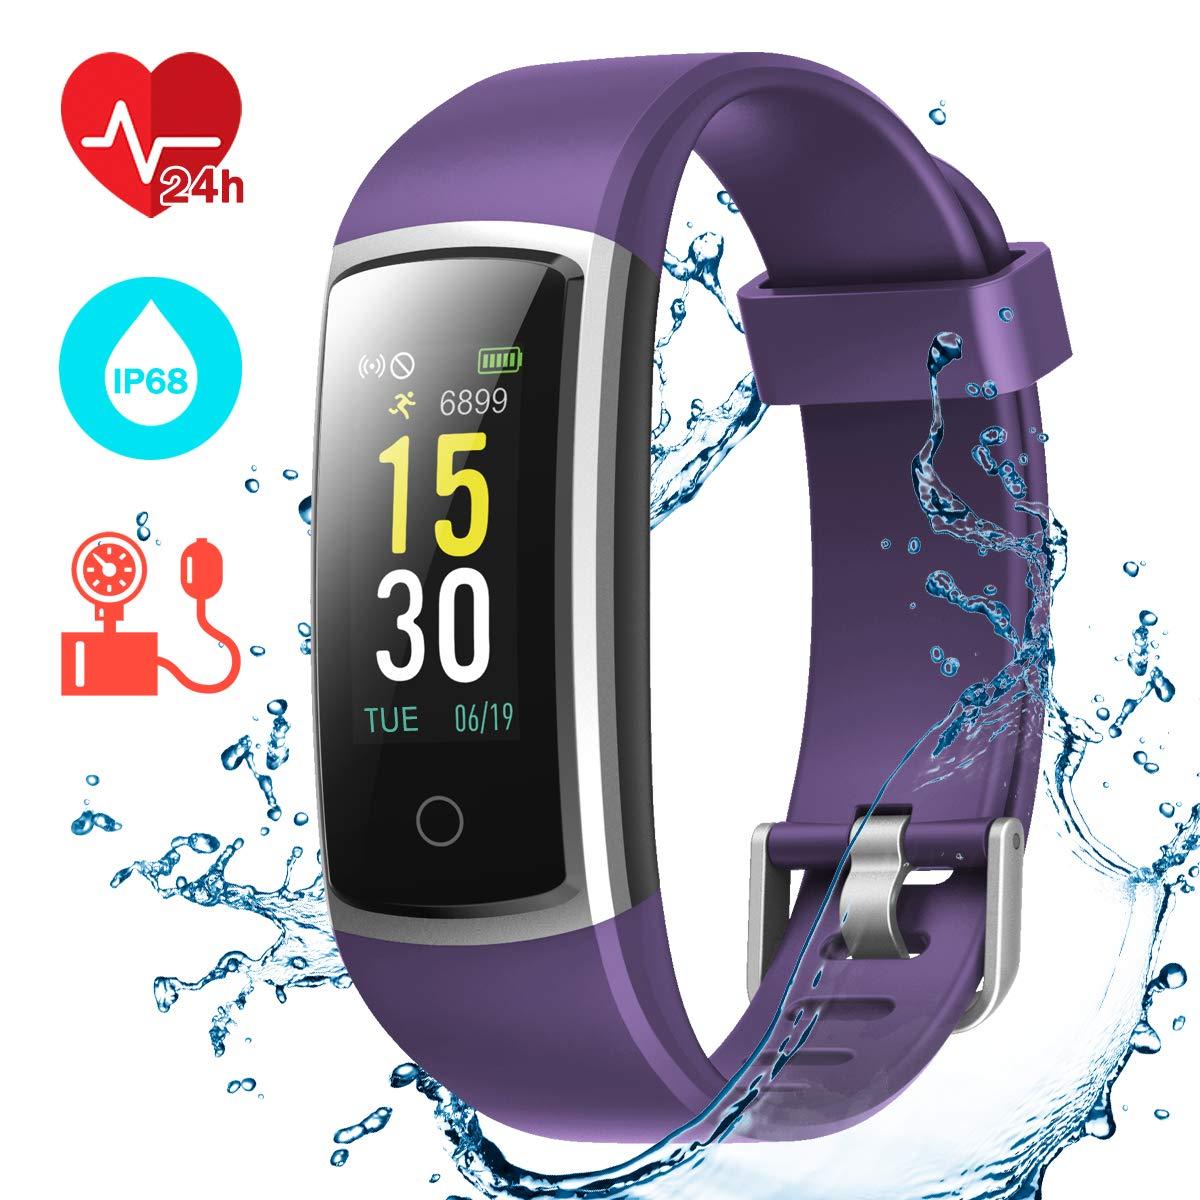 CHEREEKI Fitness Tracker, IP68 Waterproof Activity Tracker with Blood Pressure